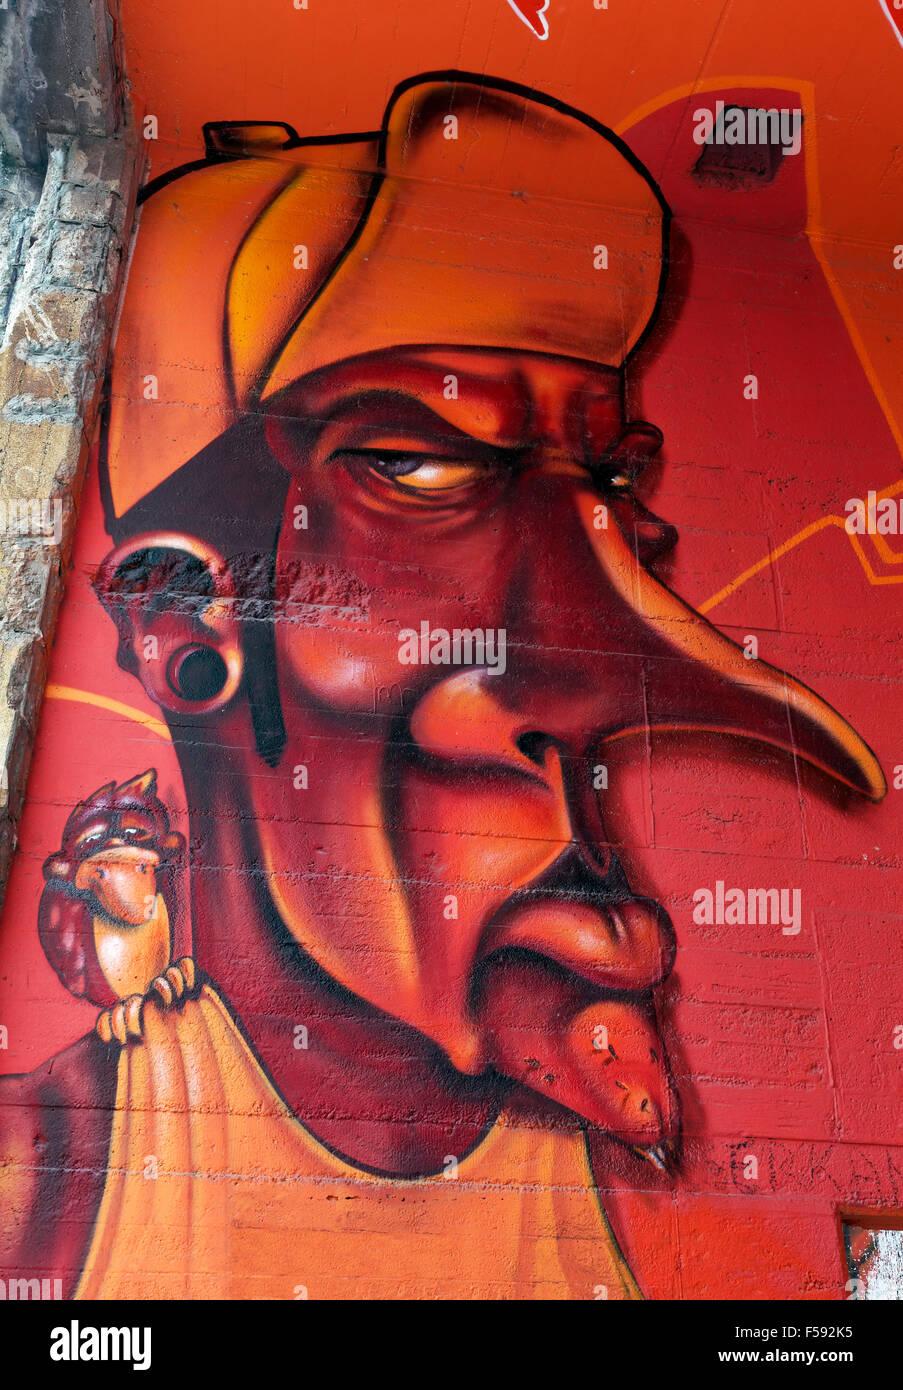 Mueca, mal de ojo, nariz larga, graffiti, street art, Duisburg, Renania del Norte-Westfalia, Alemania Imagen De Stock